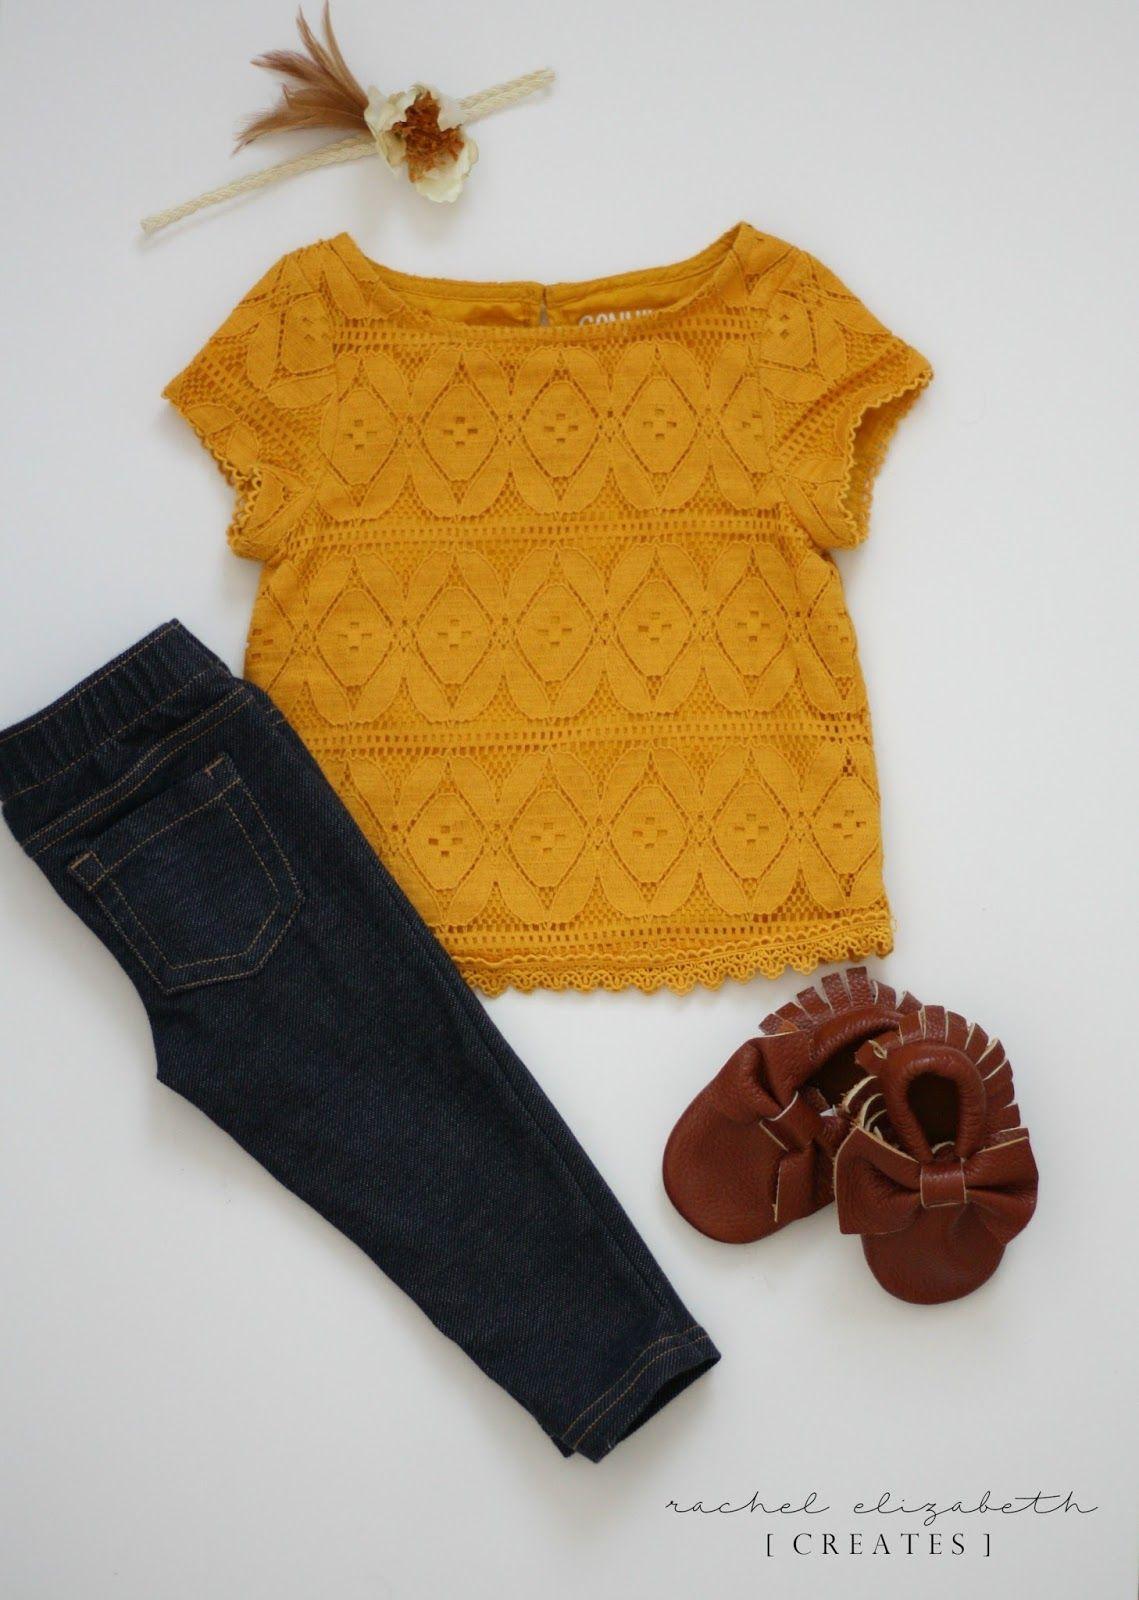 Fall Toddler Wardrobe  Rachel Elizabeth Creates  Toddler girl